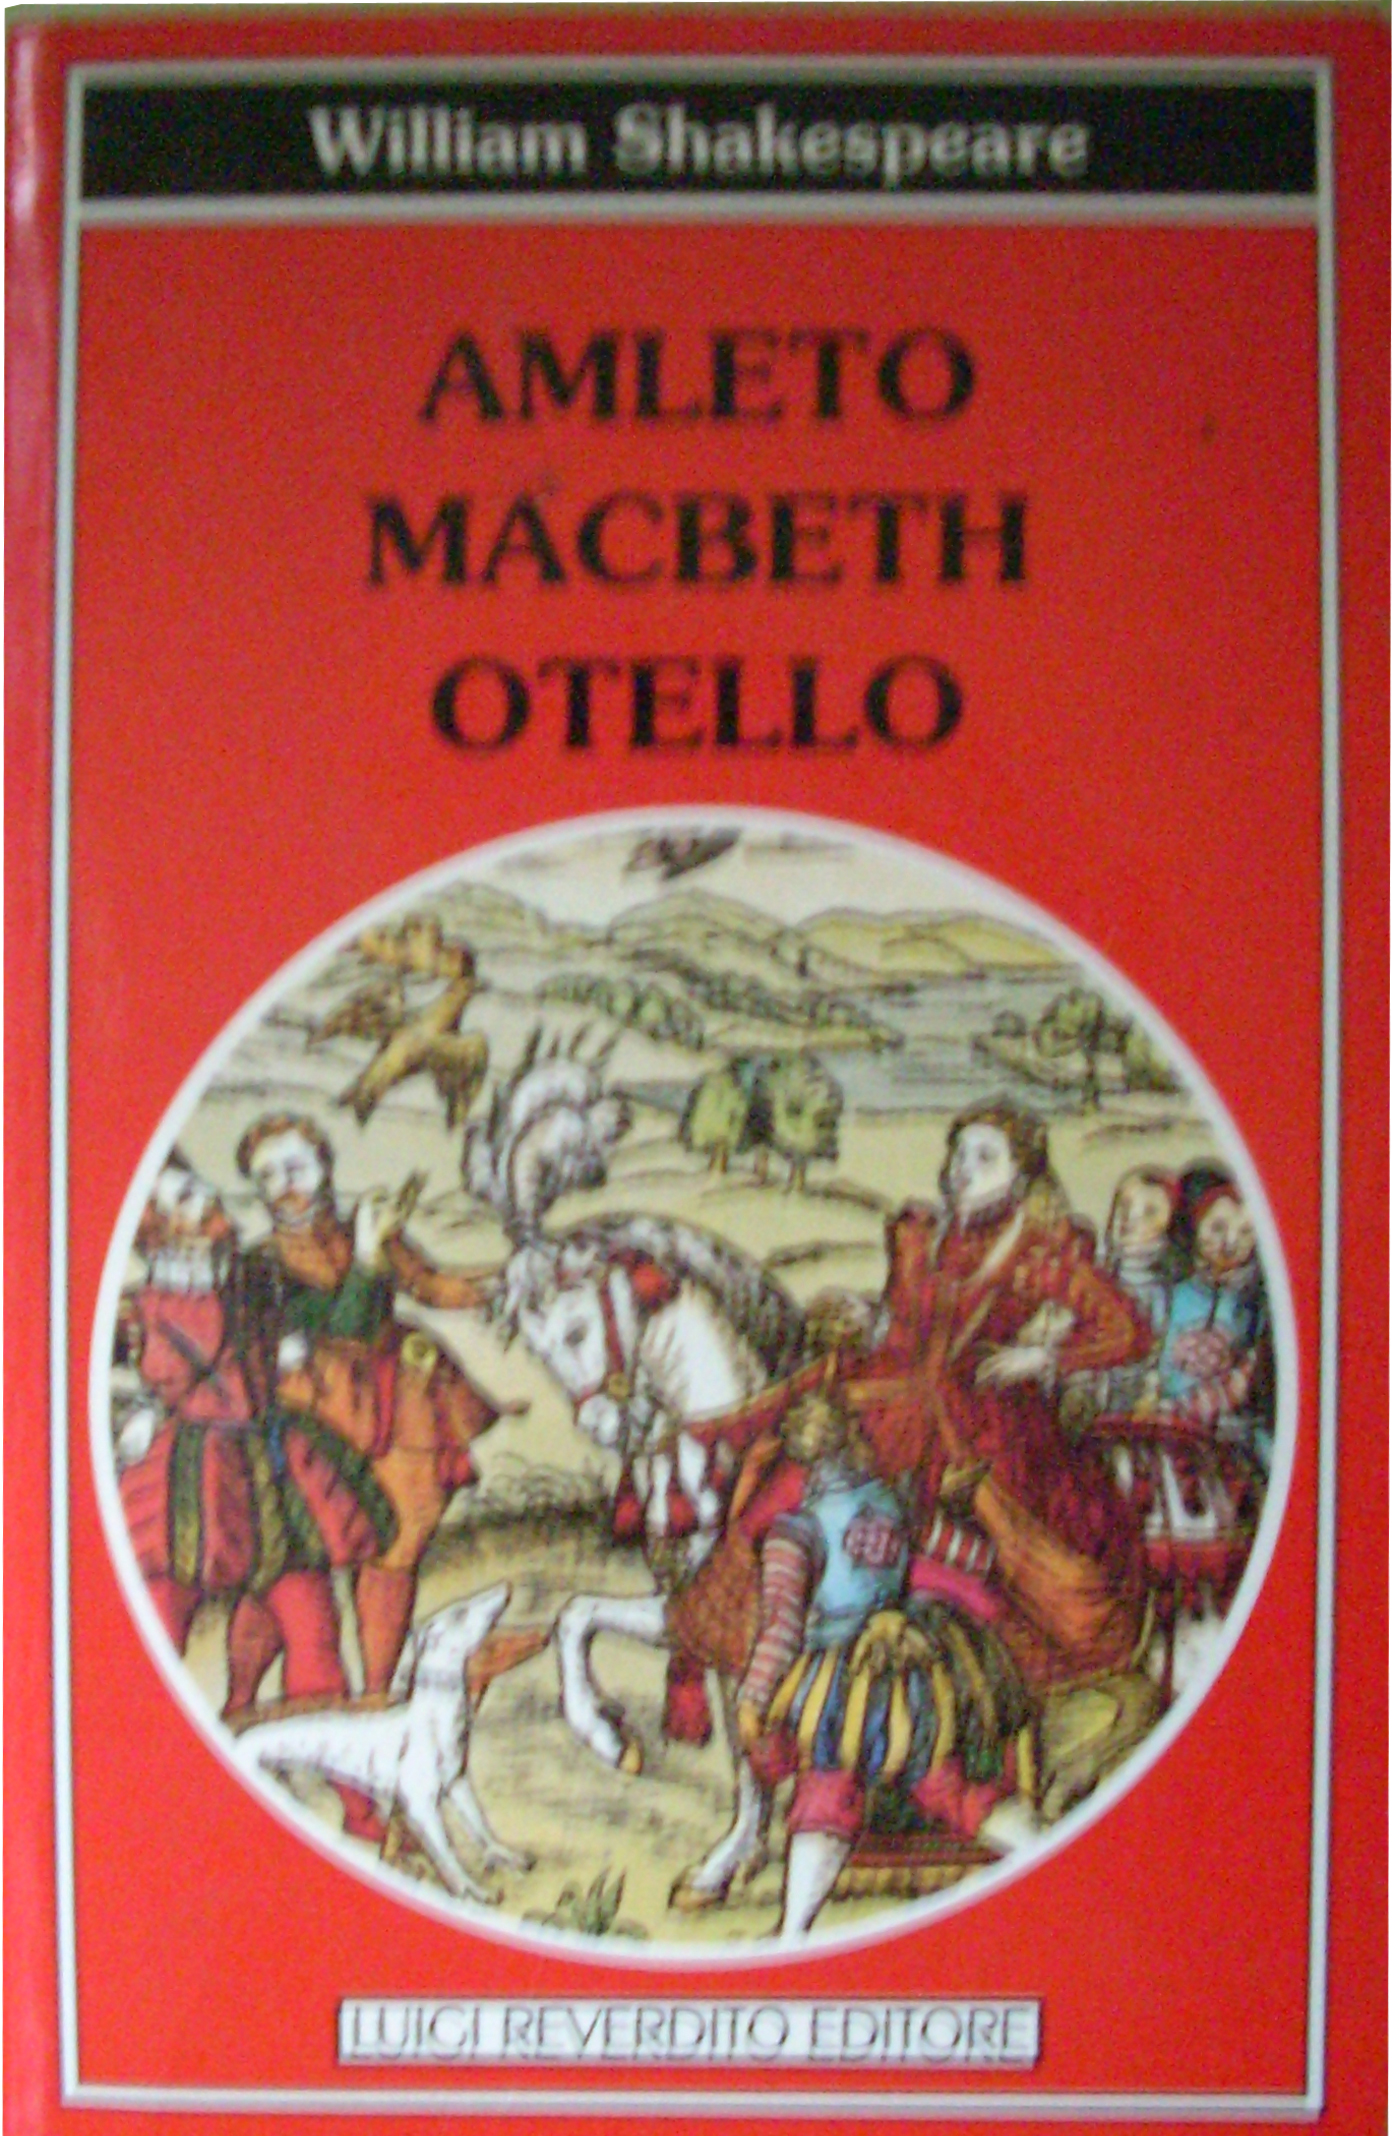 Amleto - Macbeth - Otello